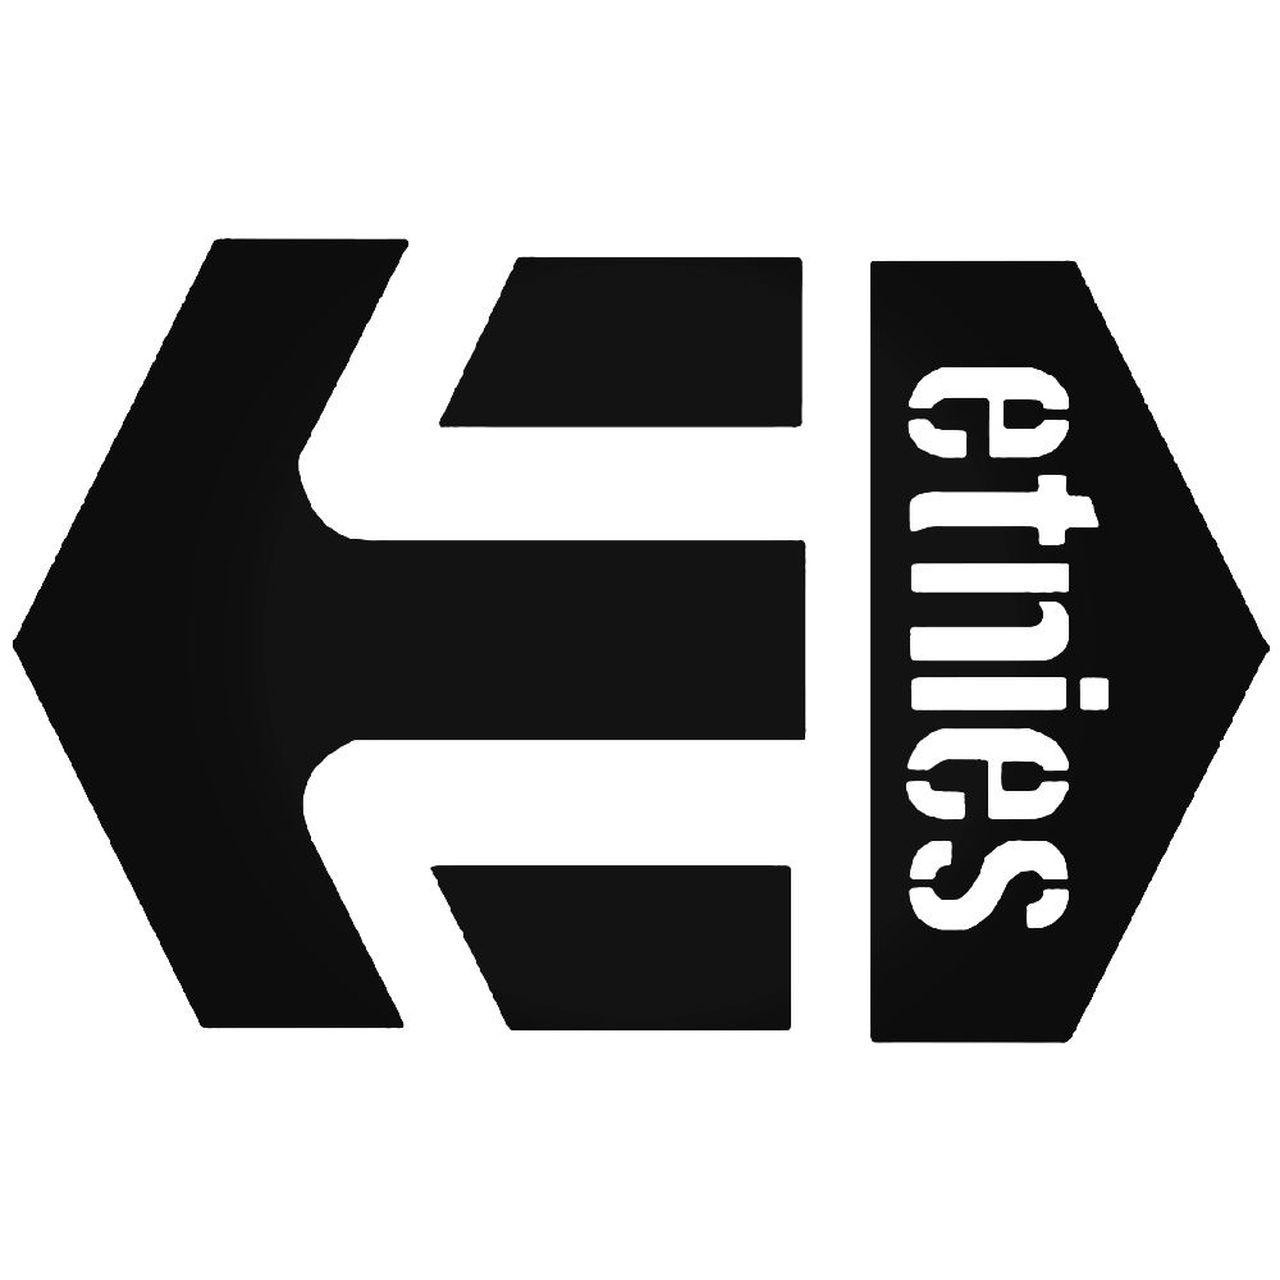 Etnies Logo 1 Sticker.